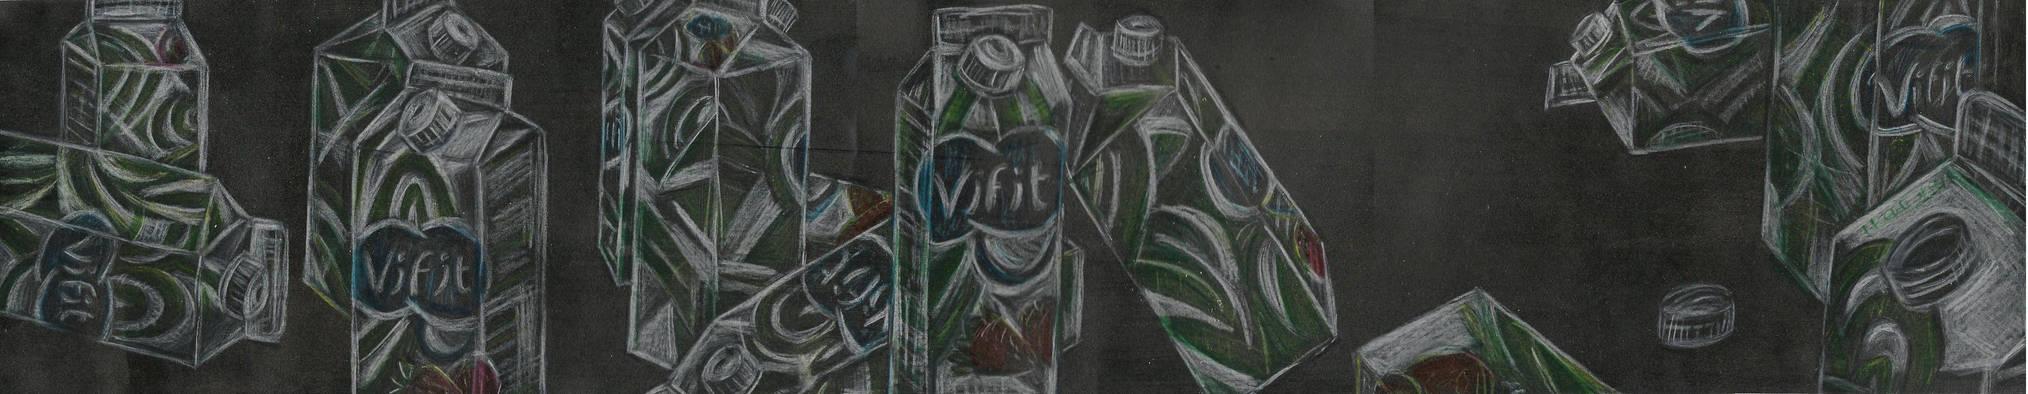 Vifit '11